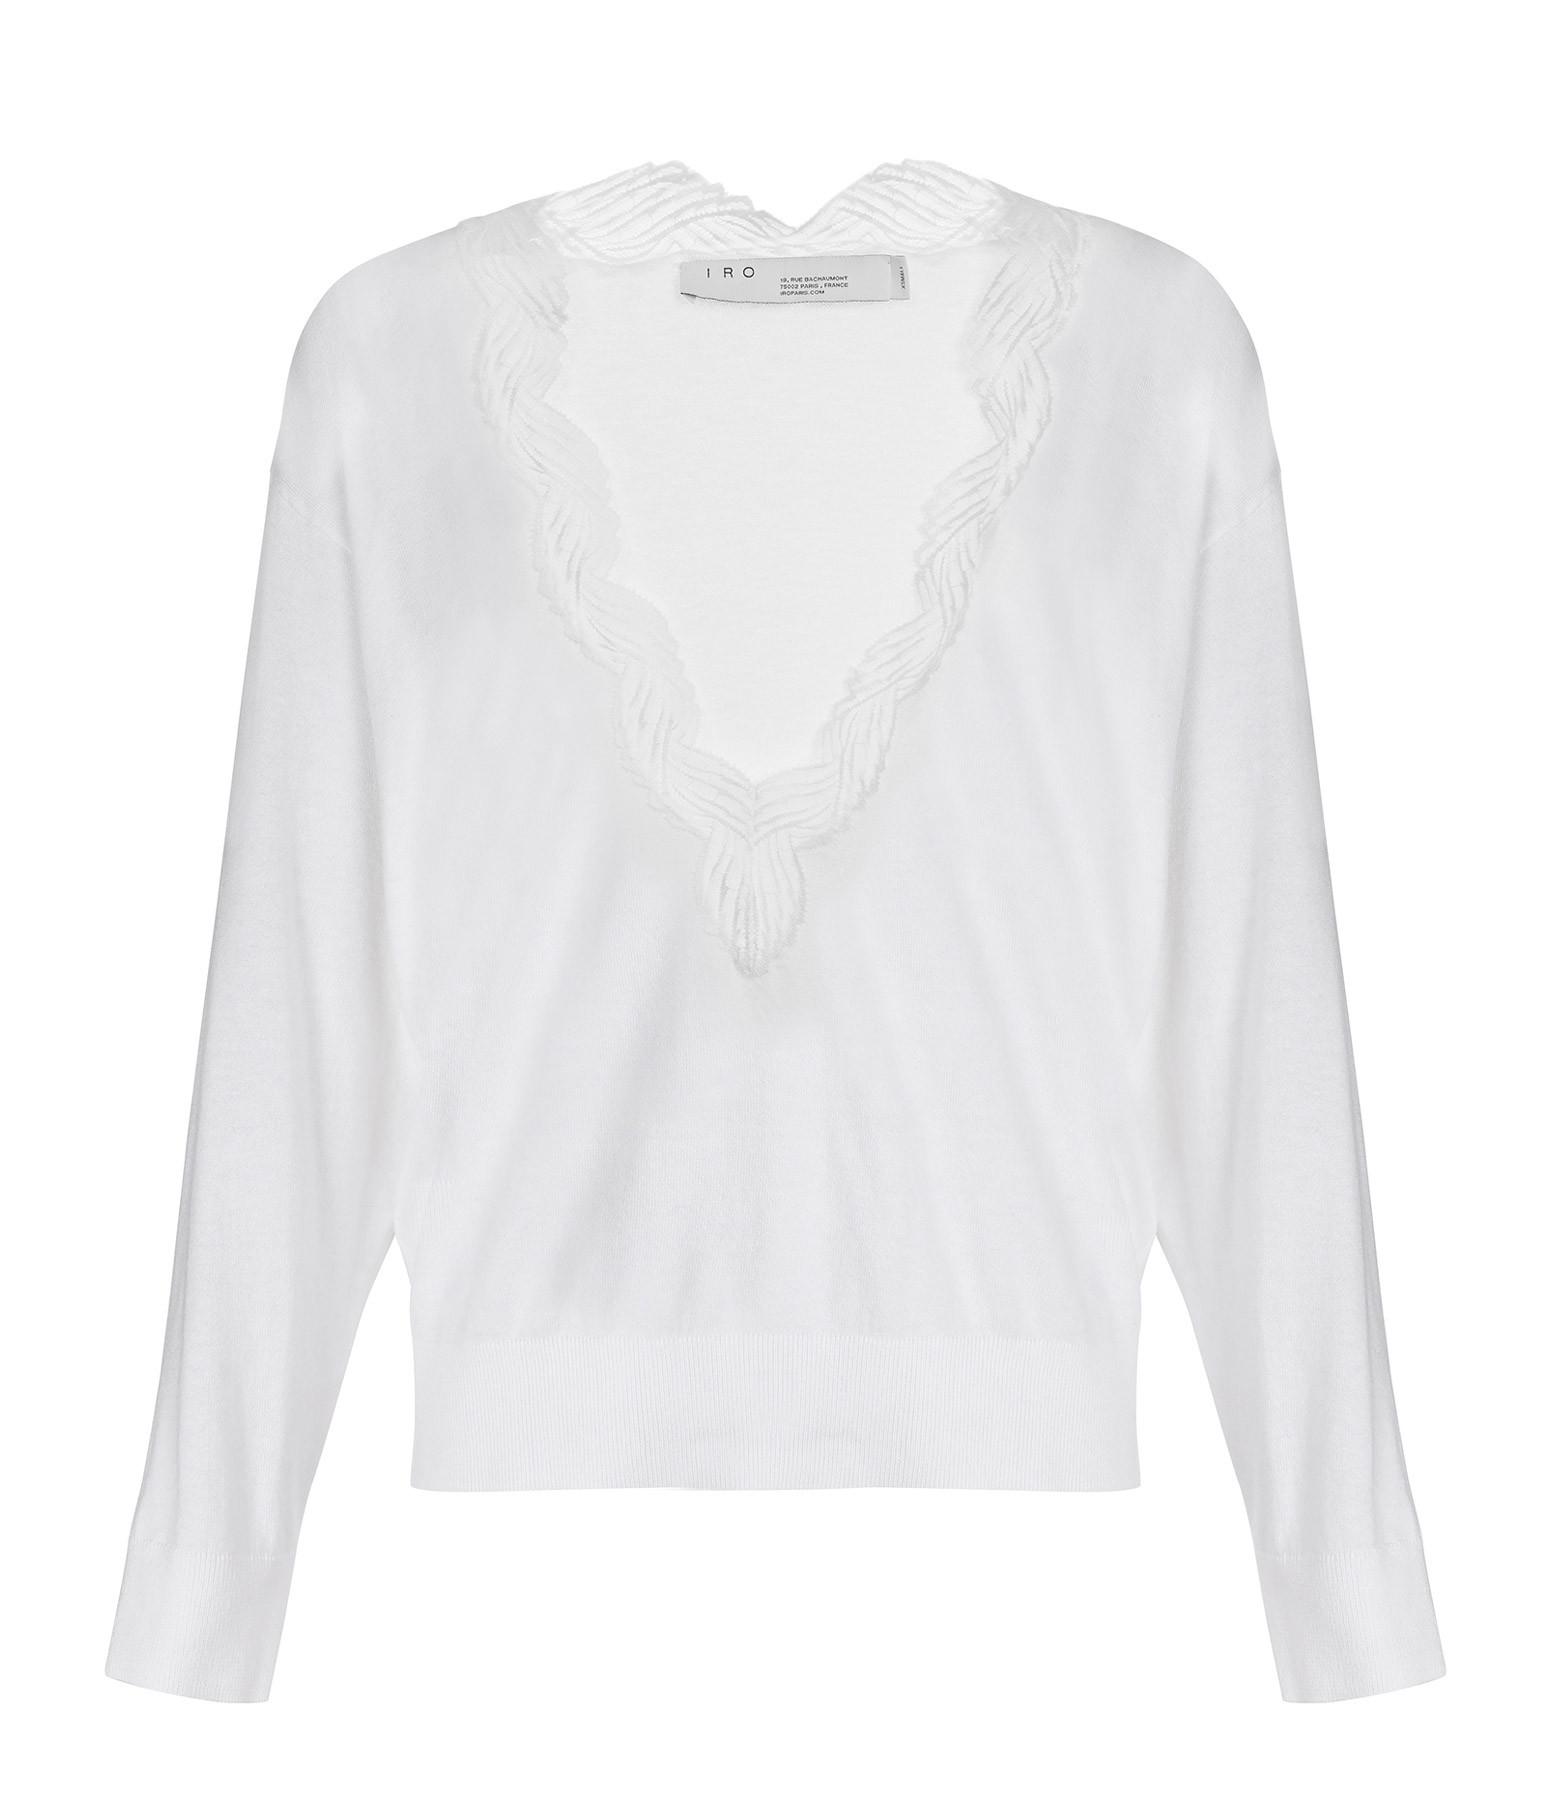 IRO - Pull Juny Coton Blanc